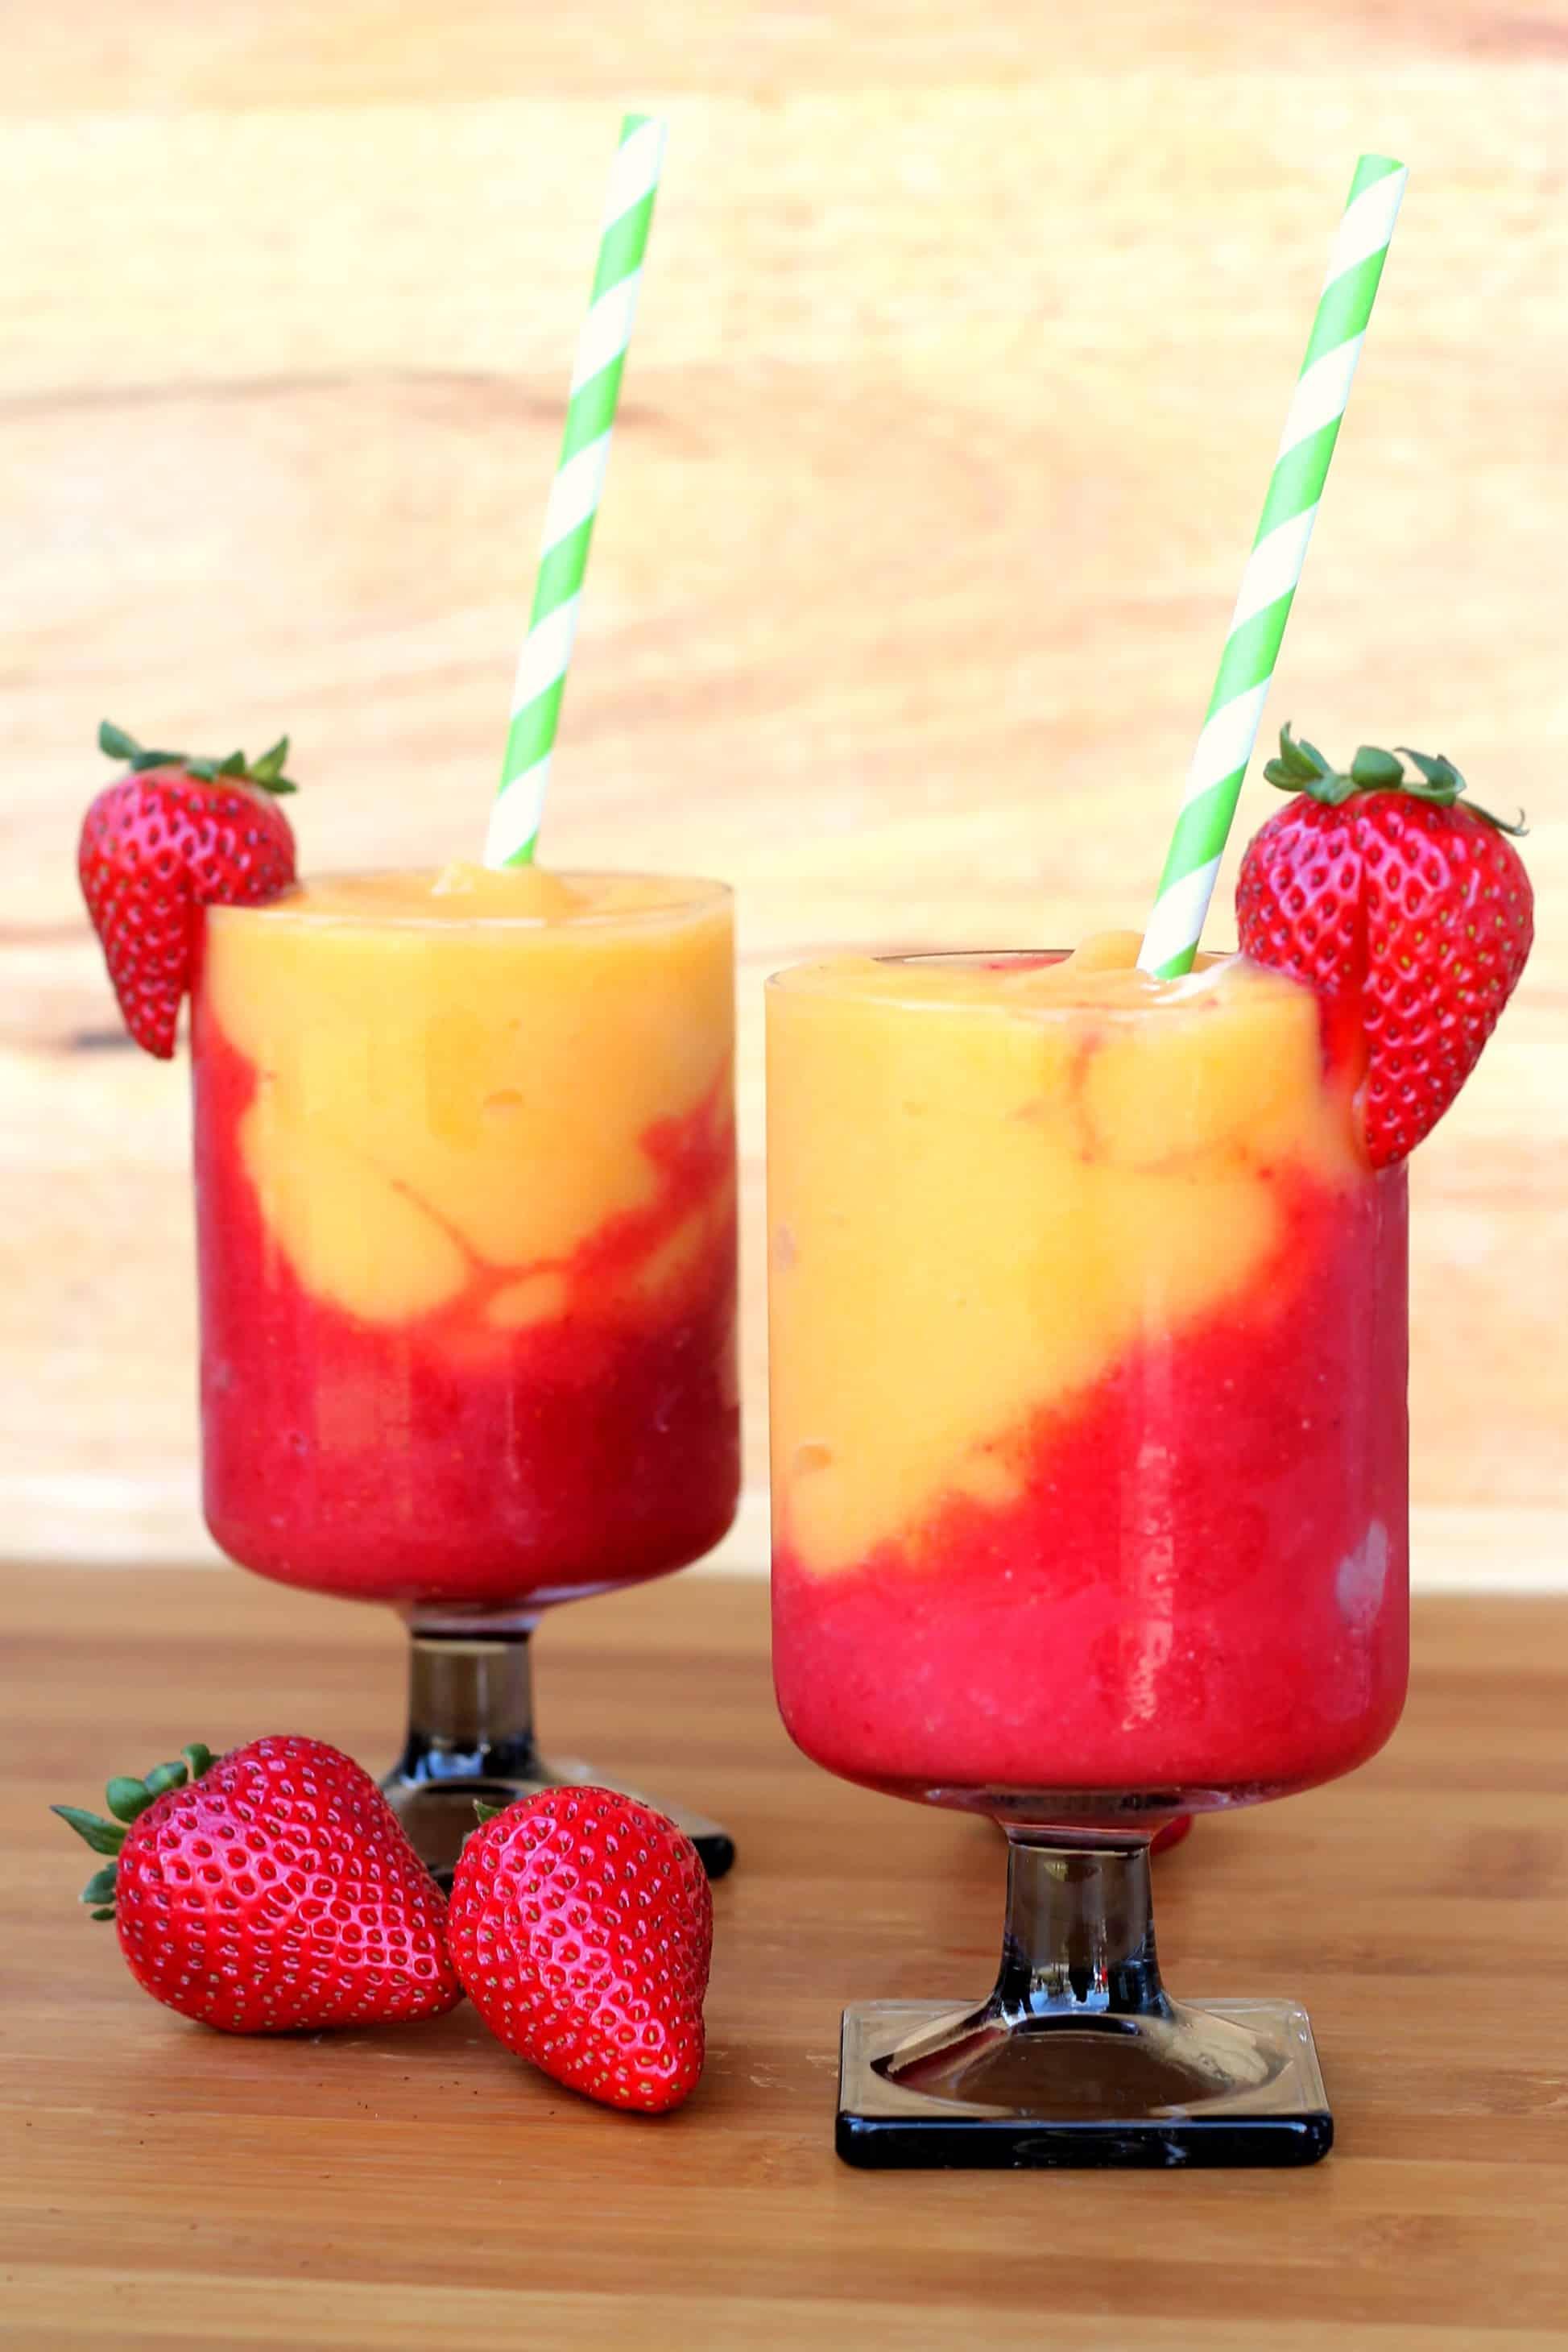 Strawberry and peach wine slushies